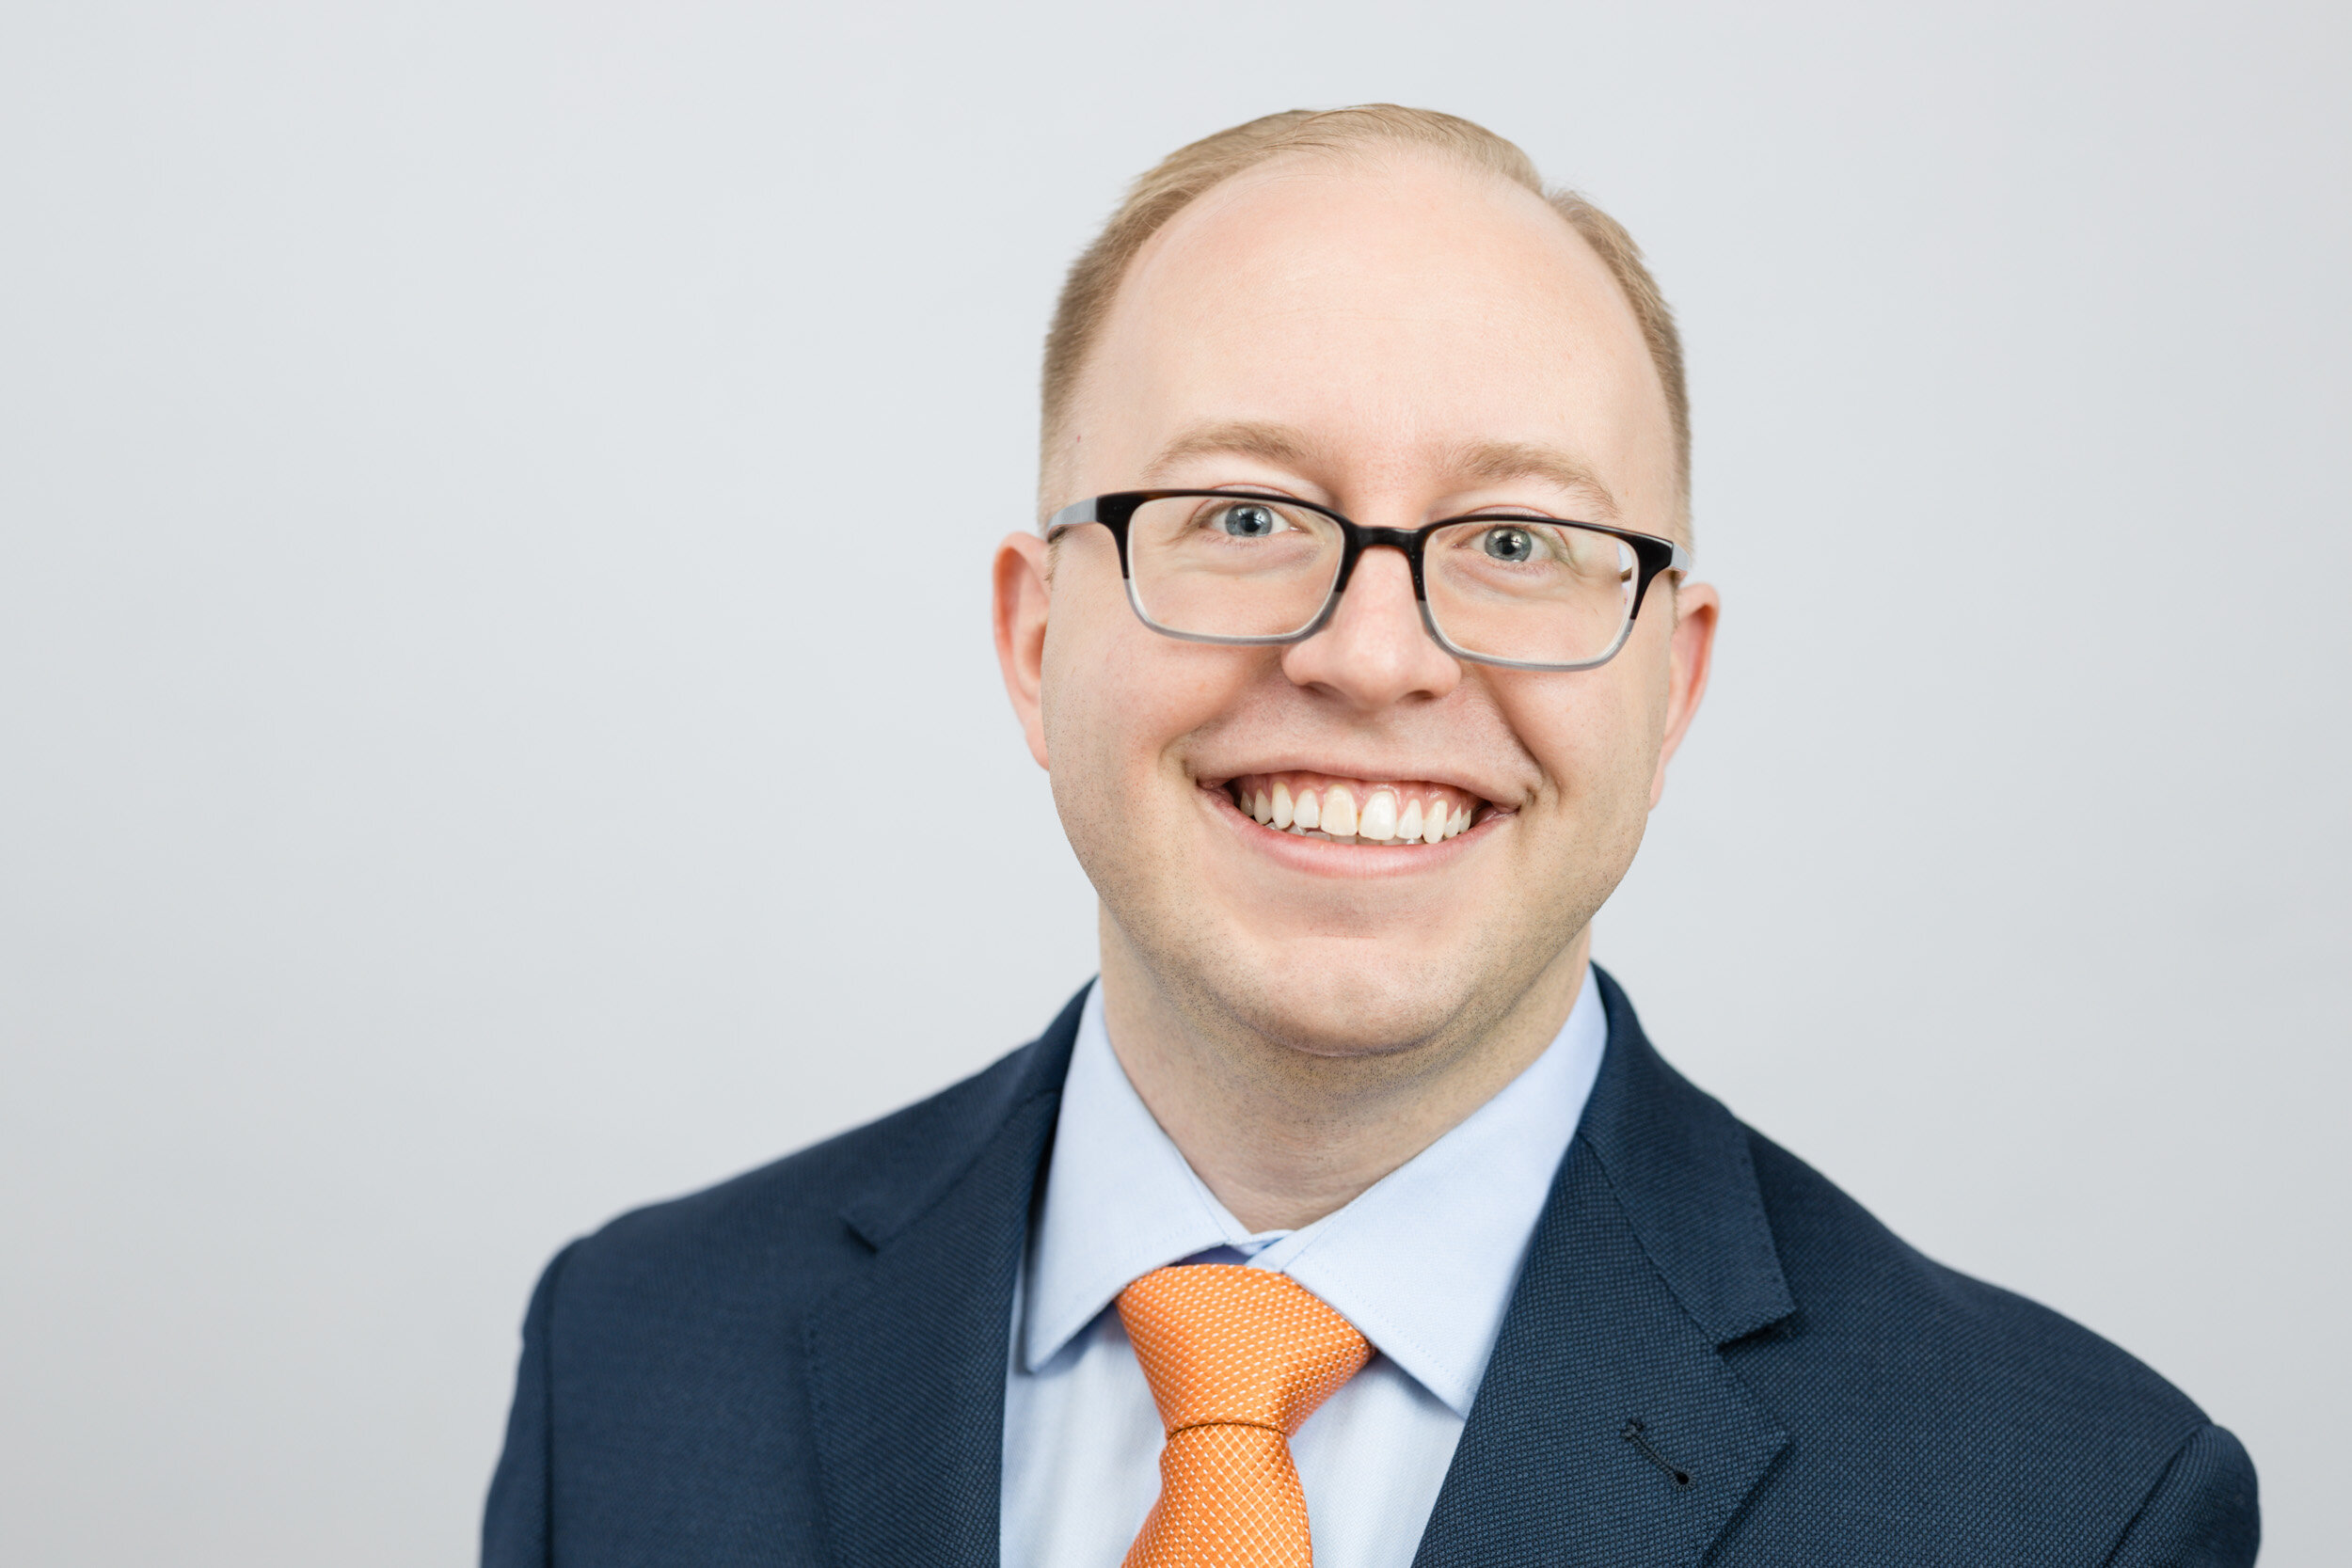 Jason Rae DNC Secretary and President LGBT Chamber of Wisconsin